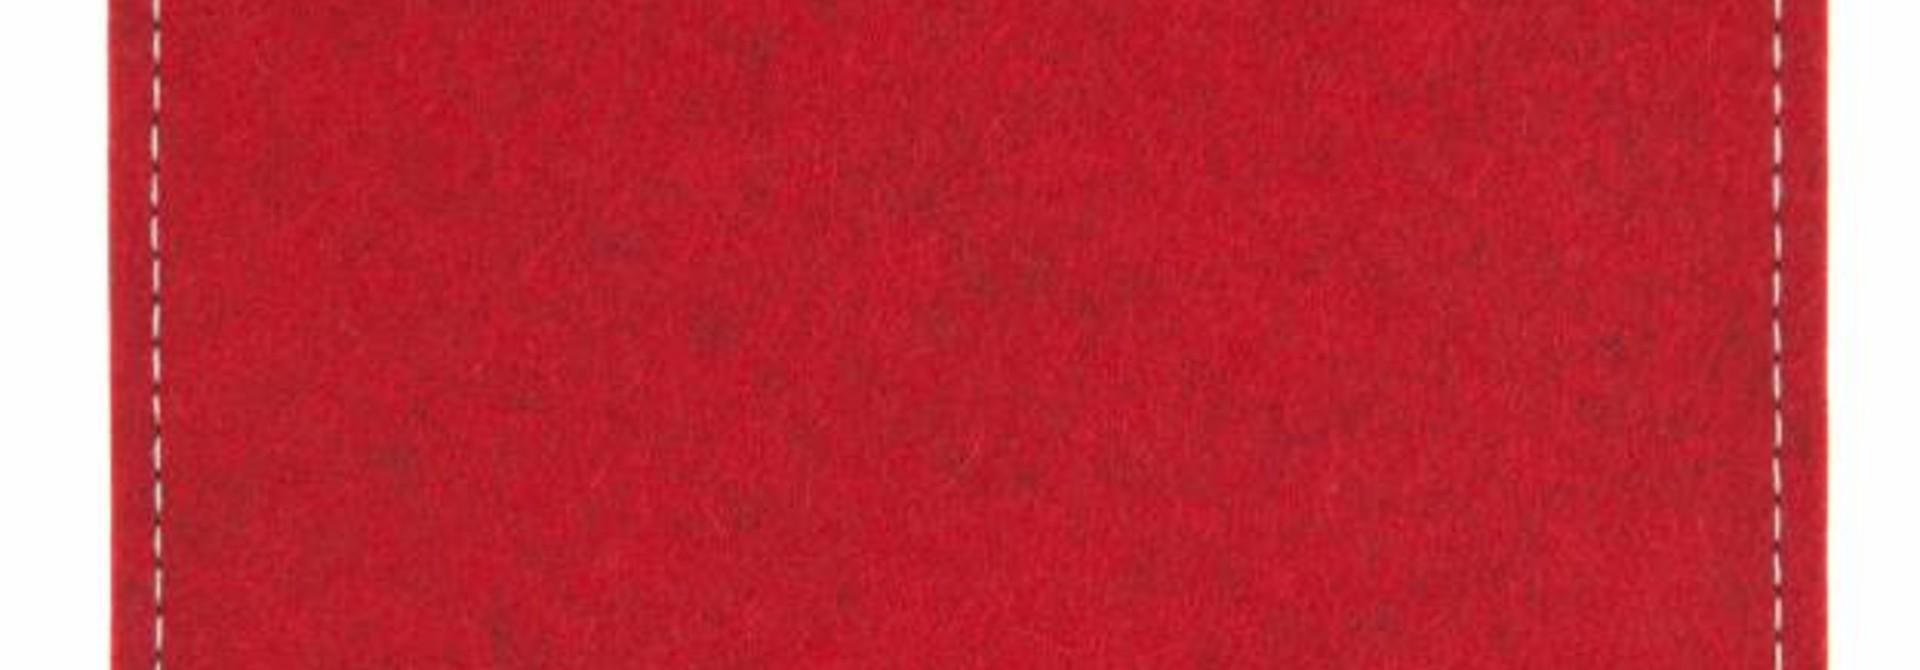 Tablet Sleeve Cherry